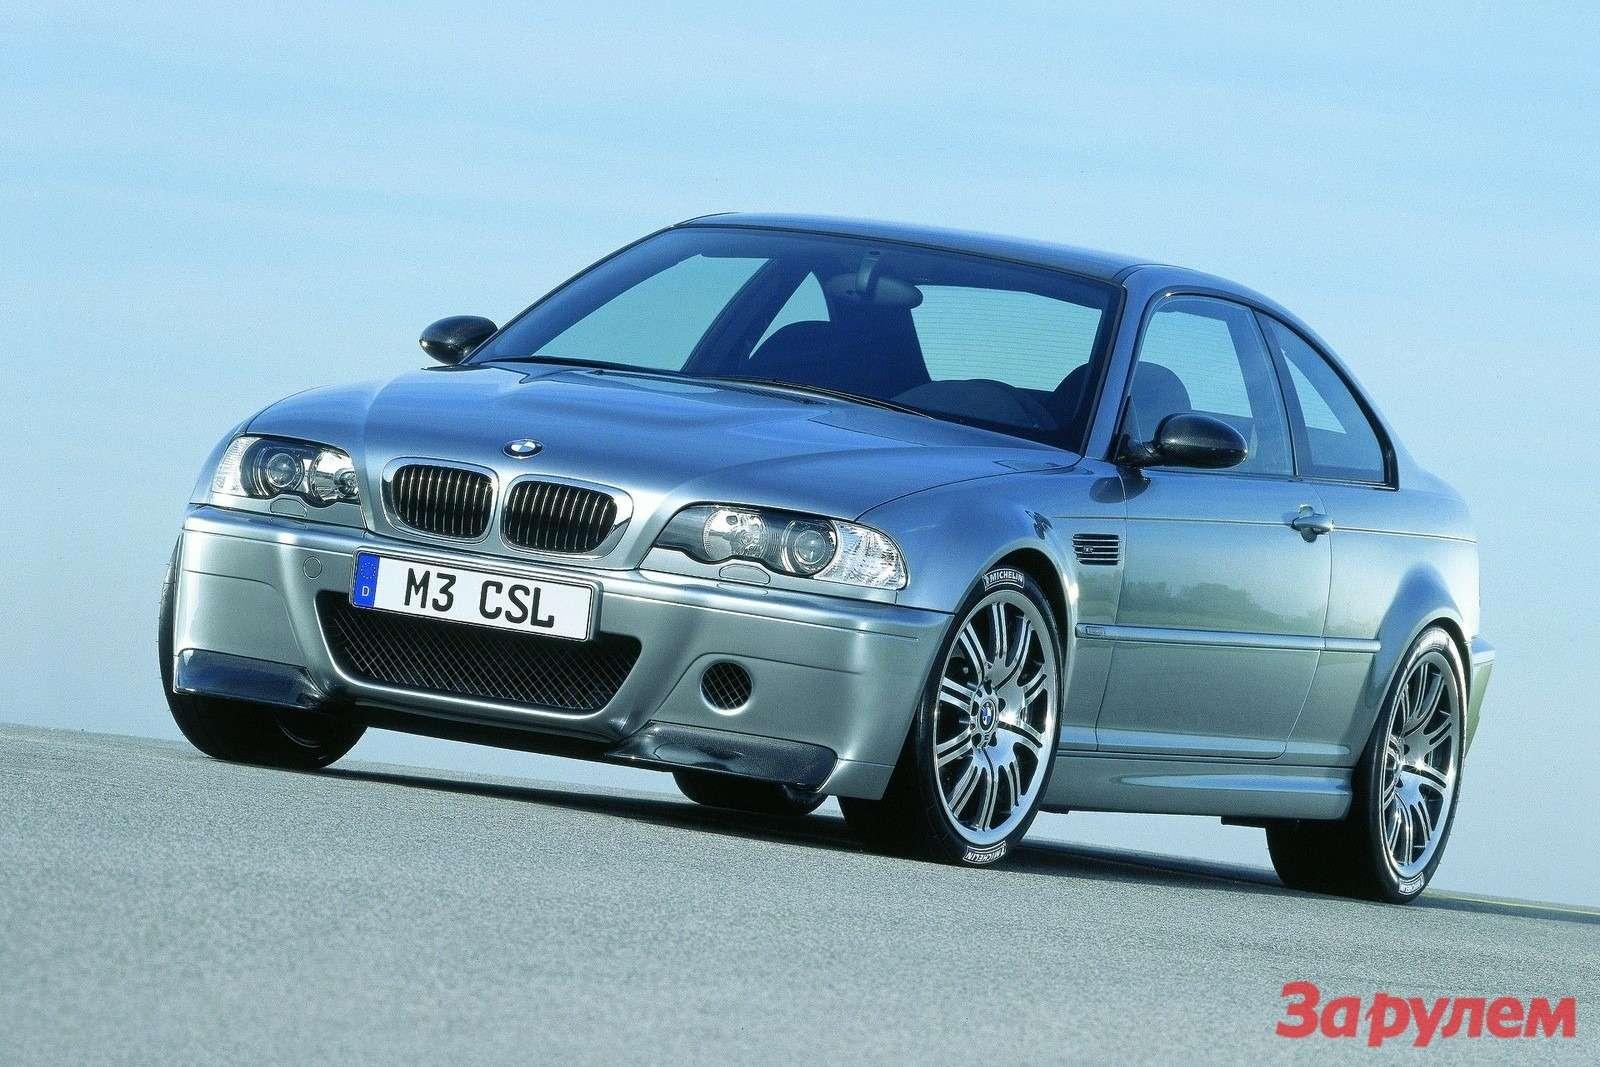 BMWM3CSL 2003 1600x1200 wallpaper 06